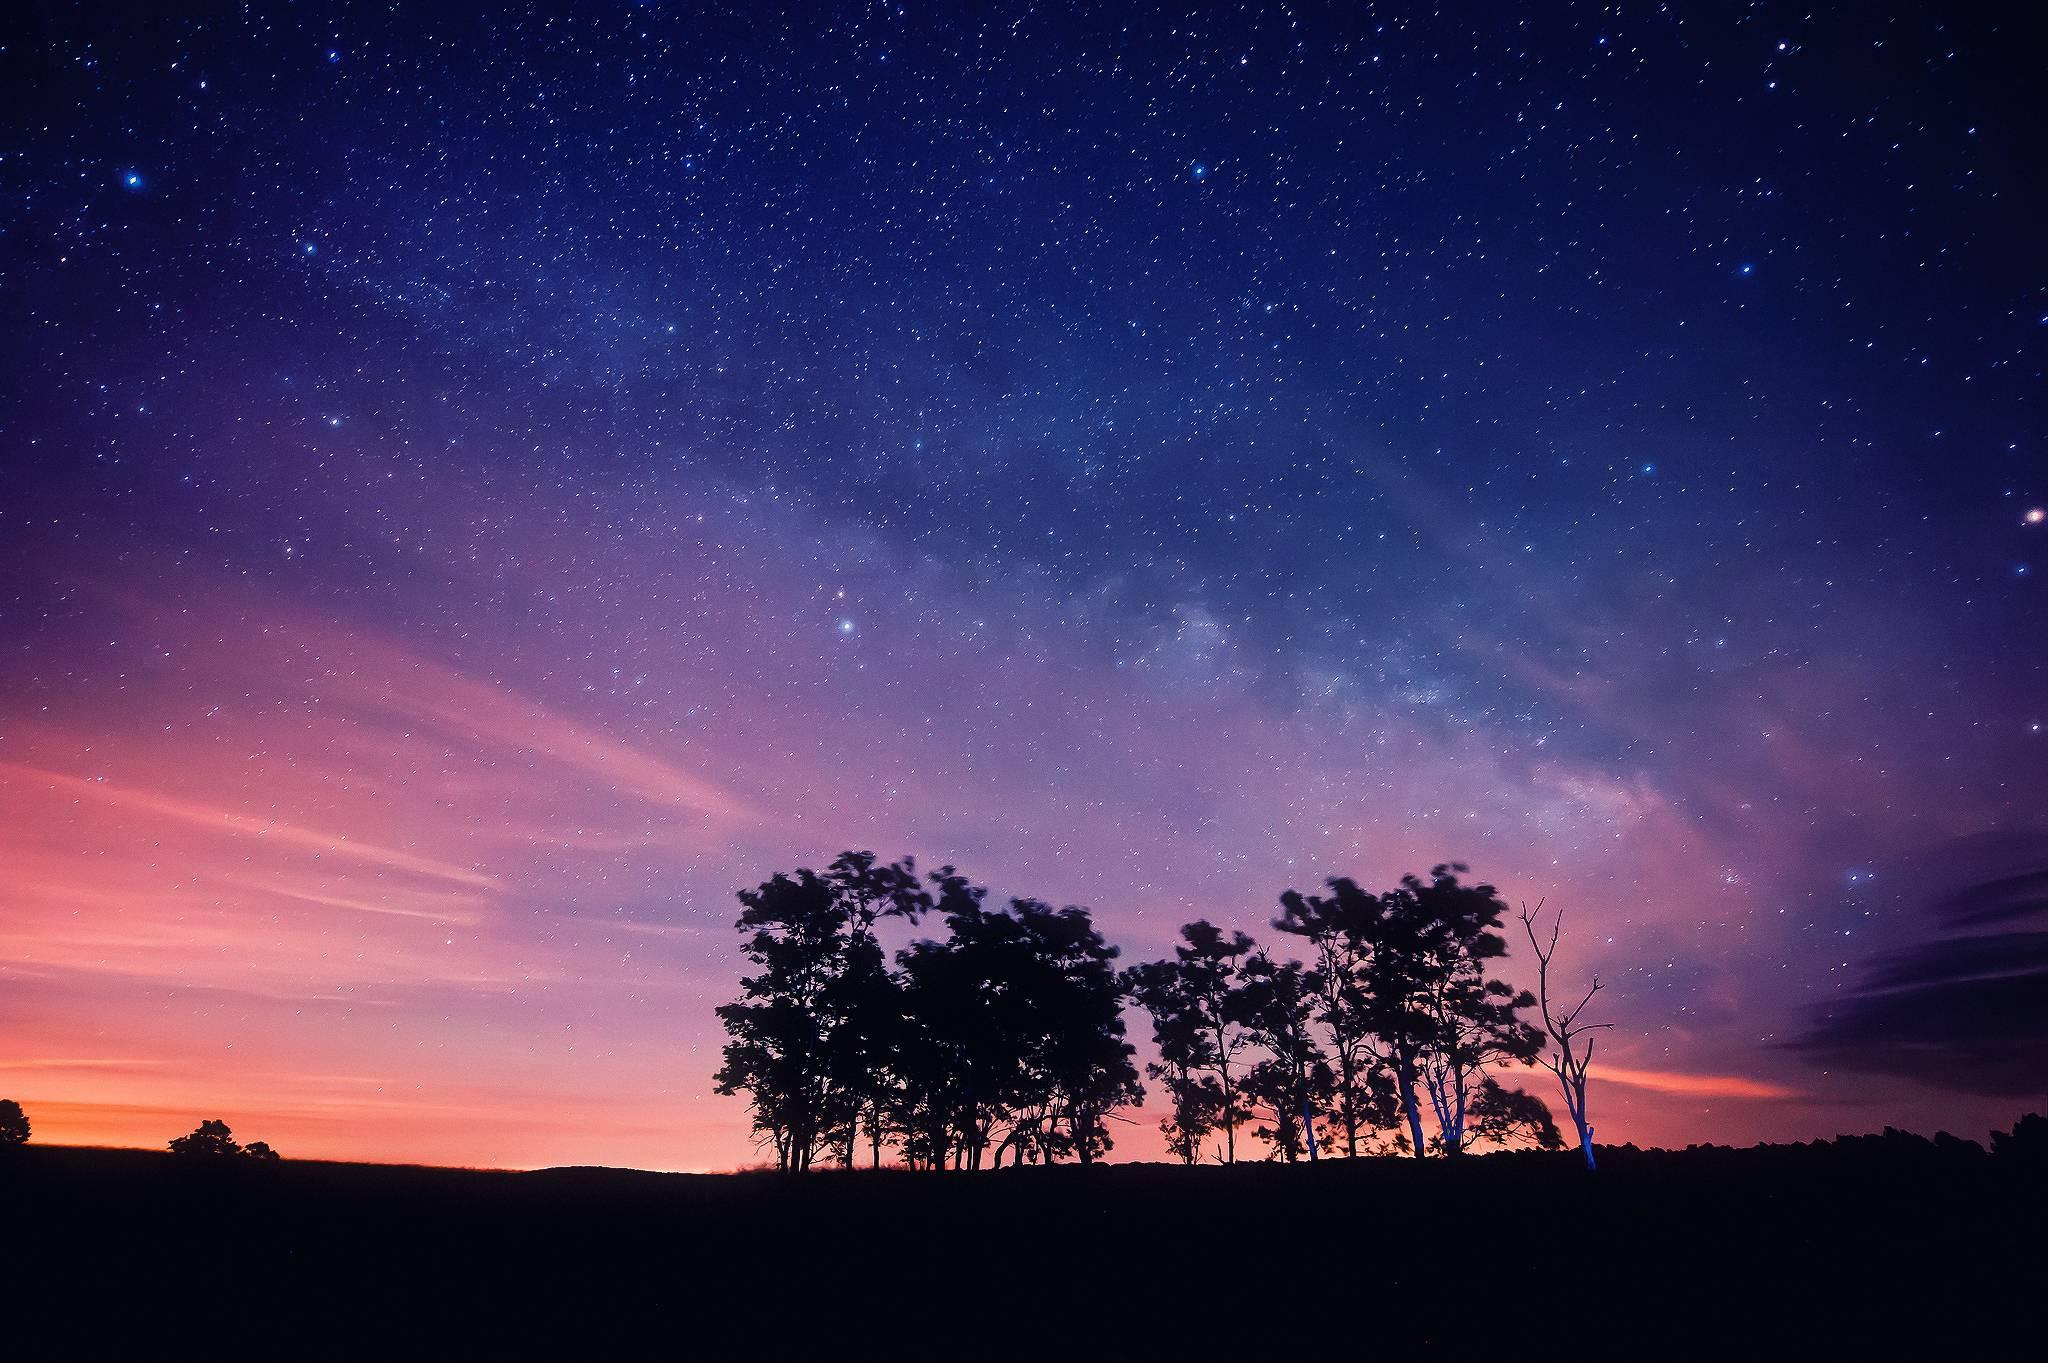 noch-nebo-zvezdy-derevya.jpg